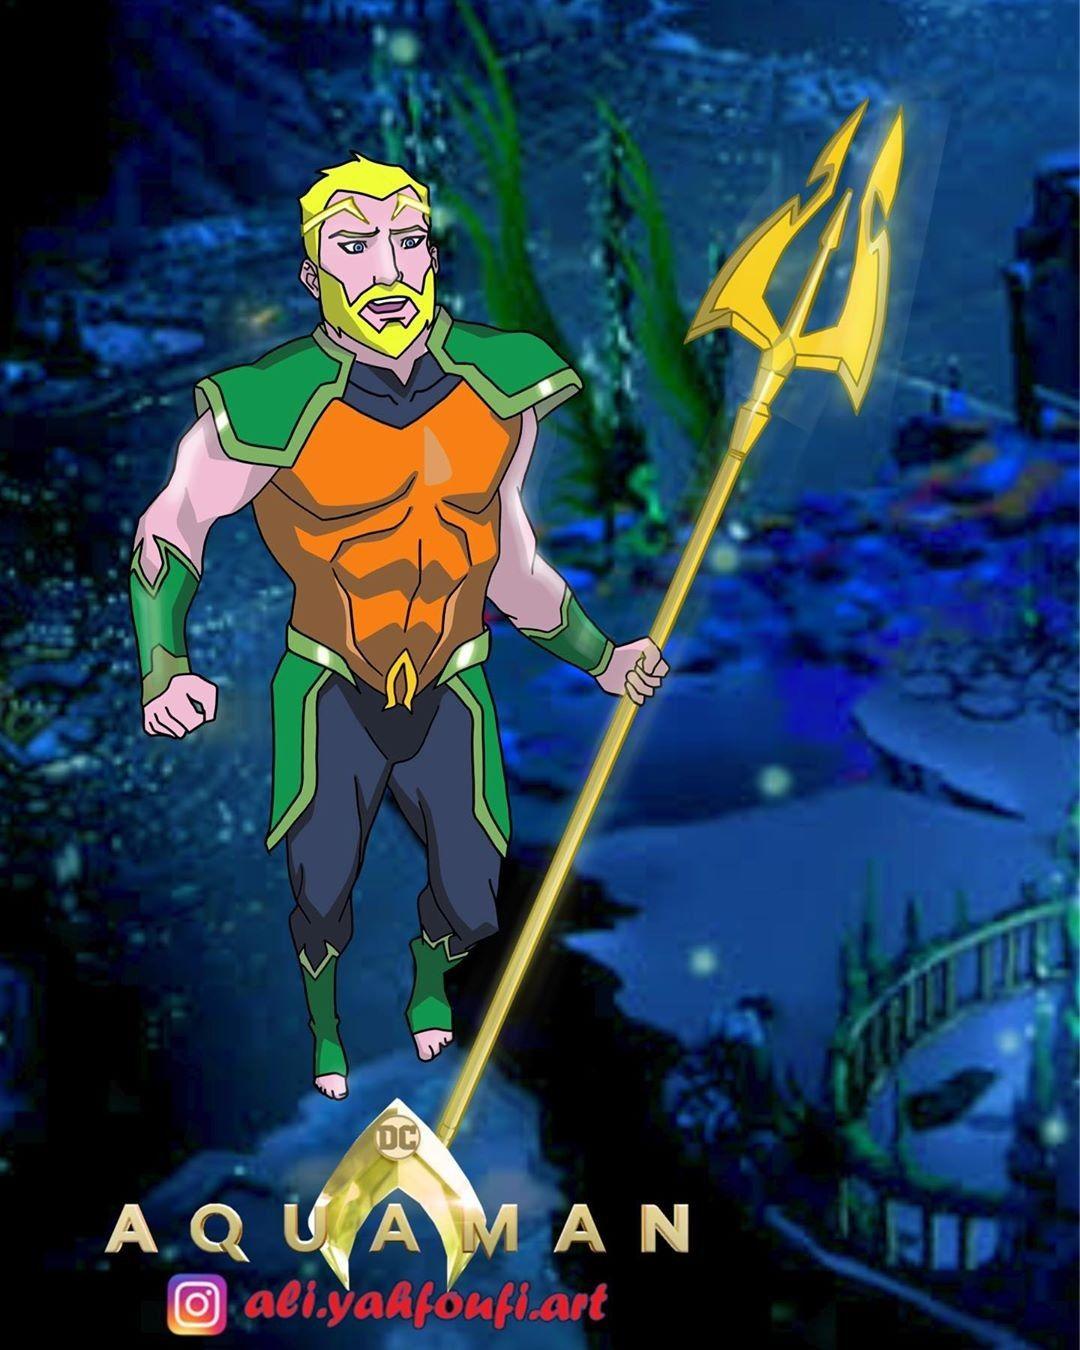 Pin By Jesus Enriquez On Atlantians Male Body Art Young Justice Season 3 Superhero